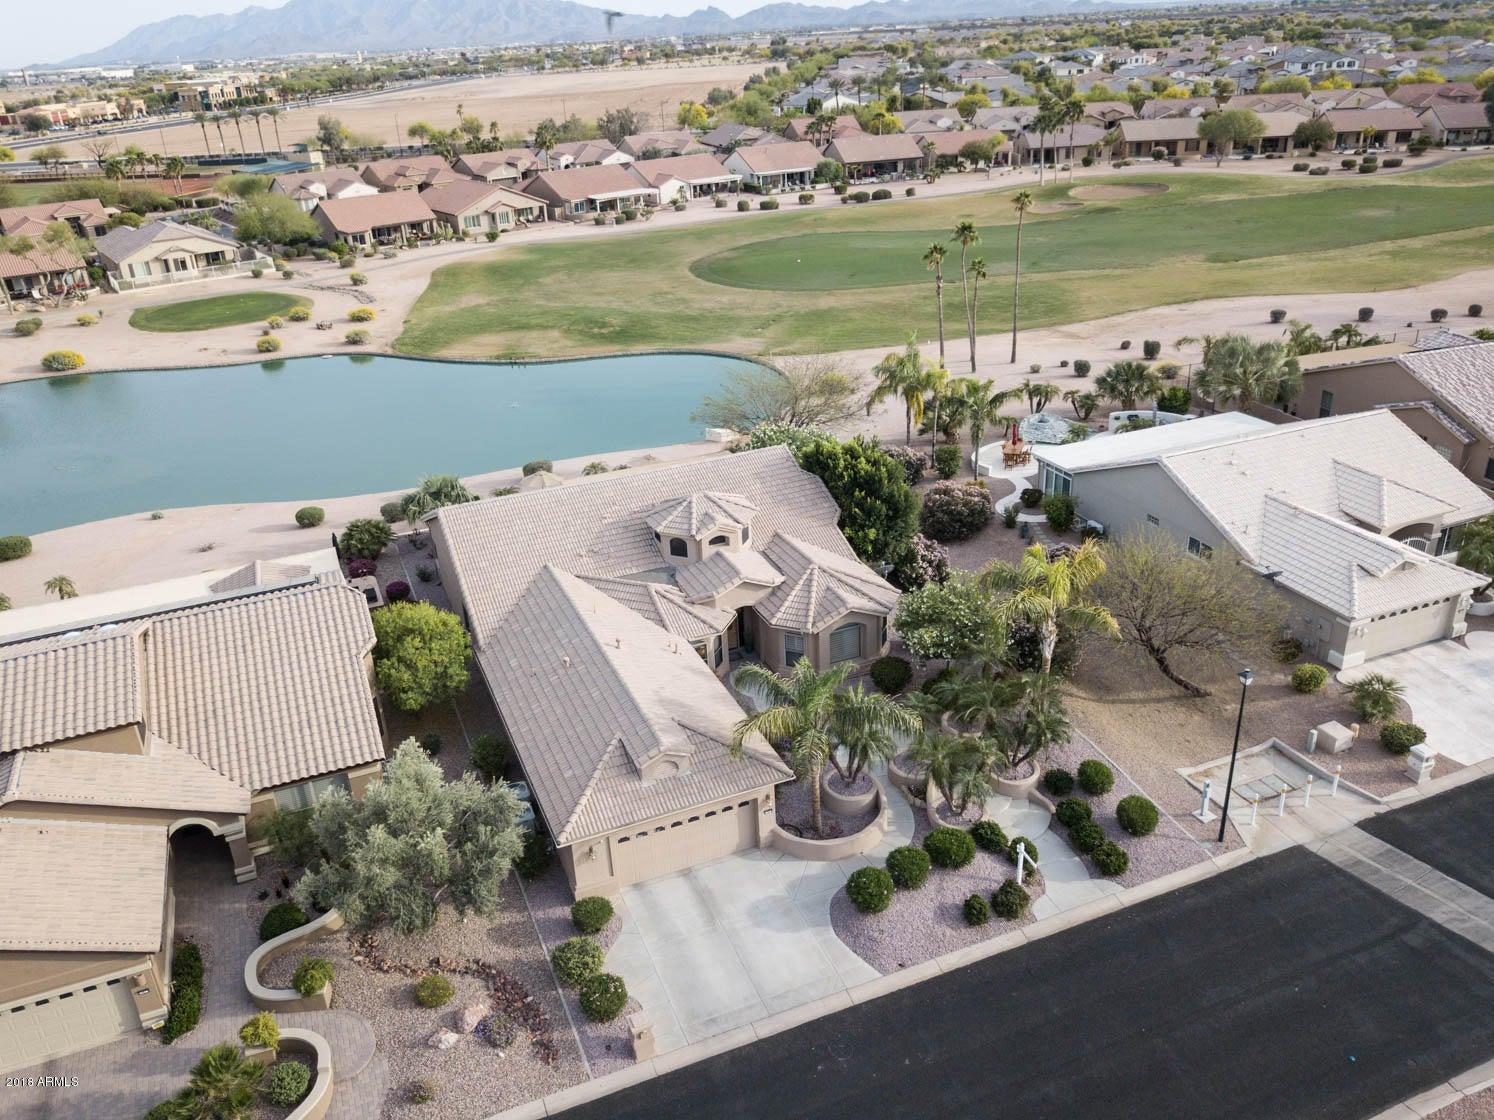 MLS 5787914 15693 W EDGEMONT Avenue, Goodyear, AZ 85395 Goodyear AZ Gated